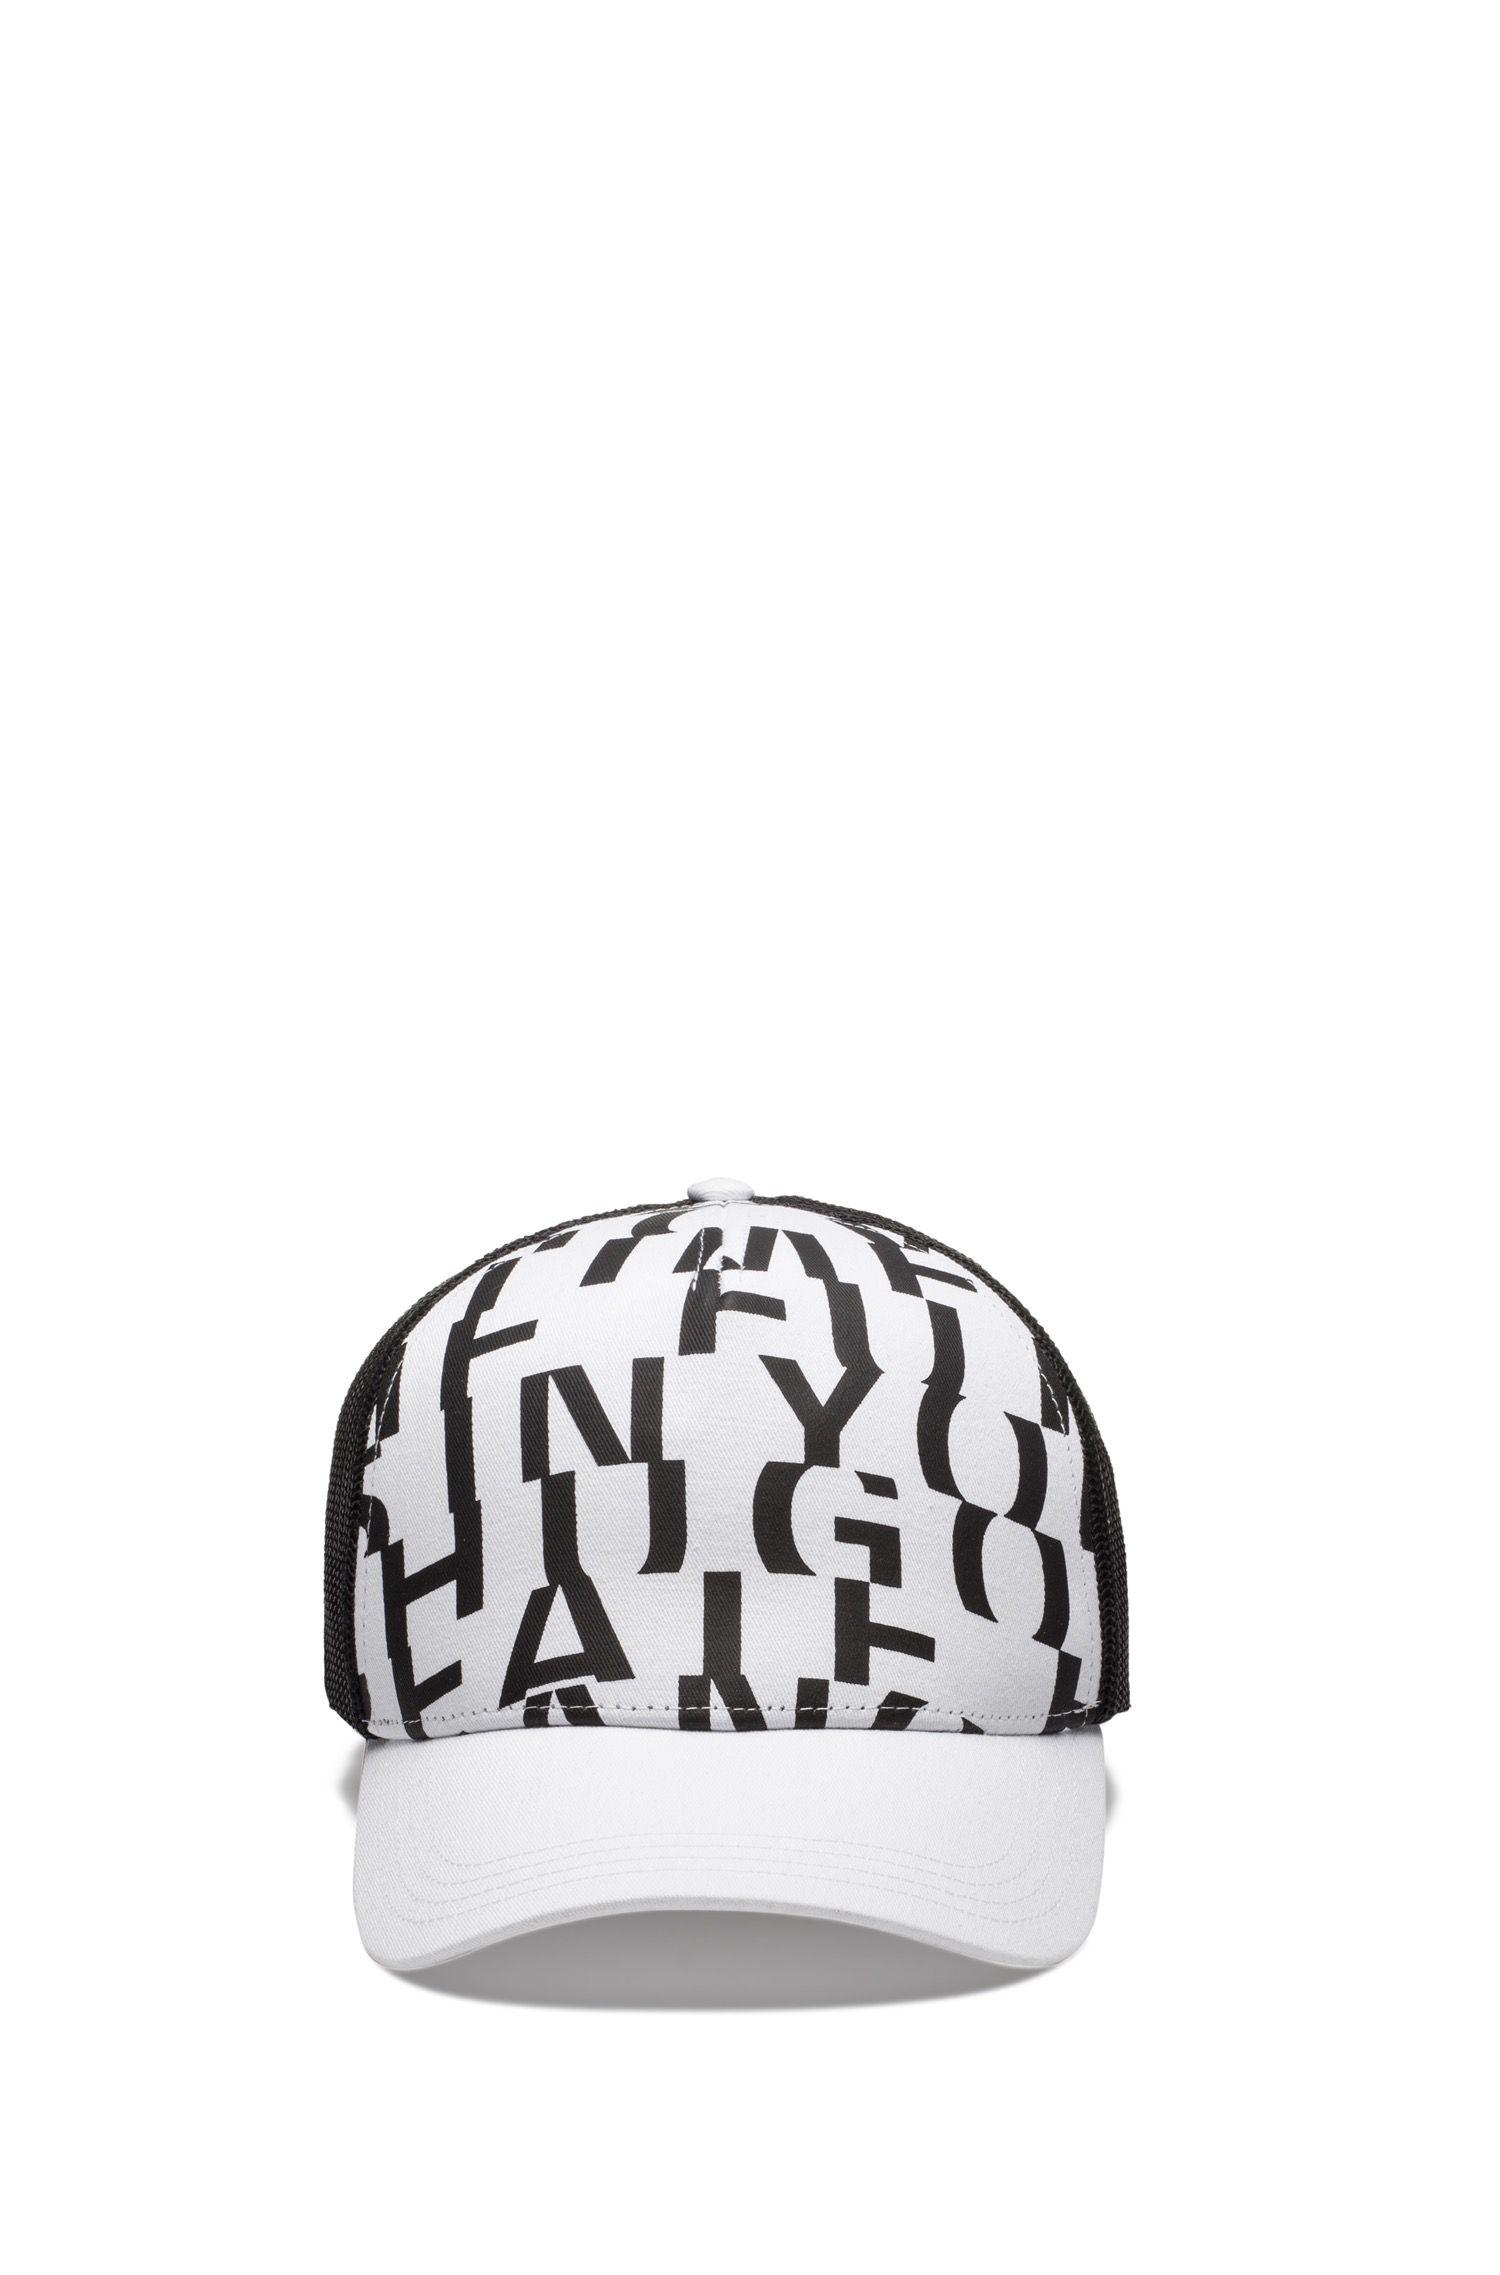 Cotton-gabardine cap with abstract slogan, White